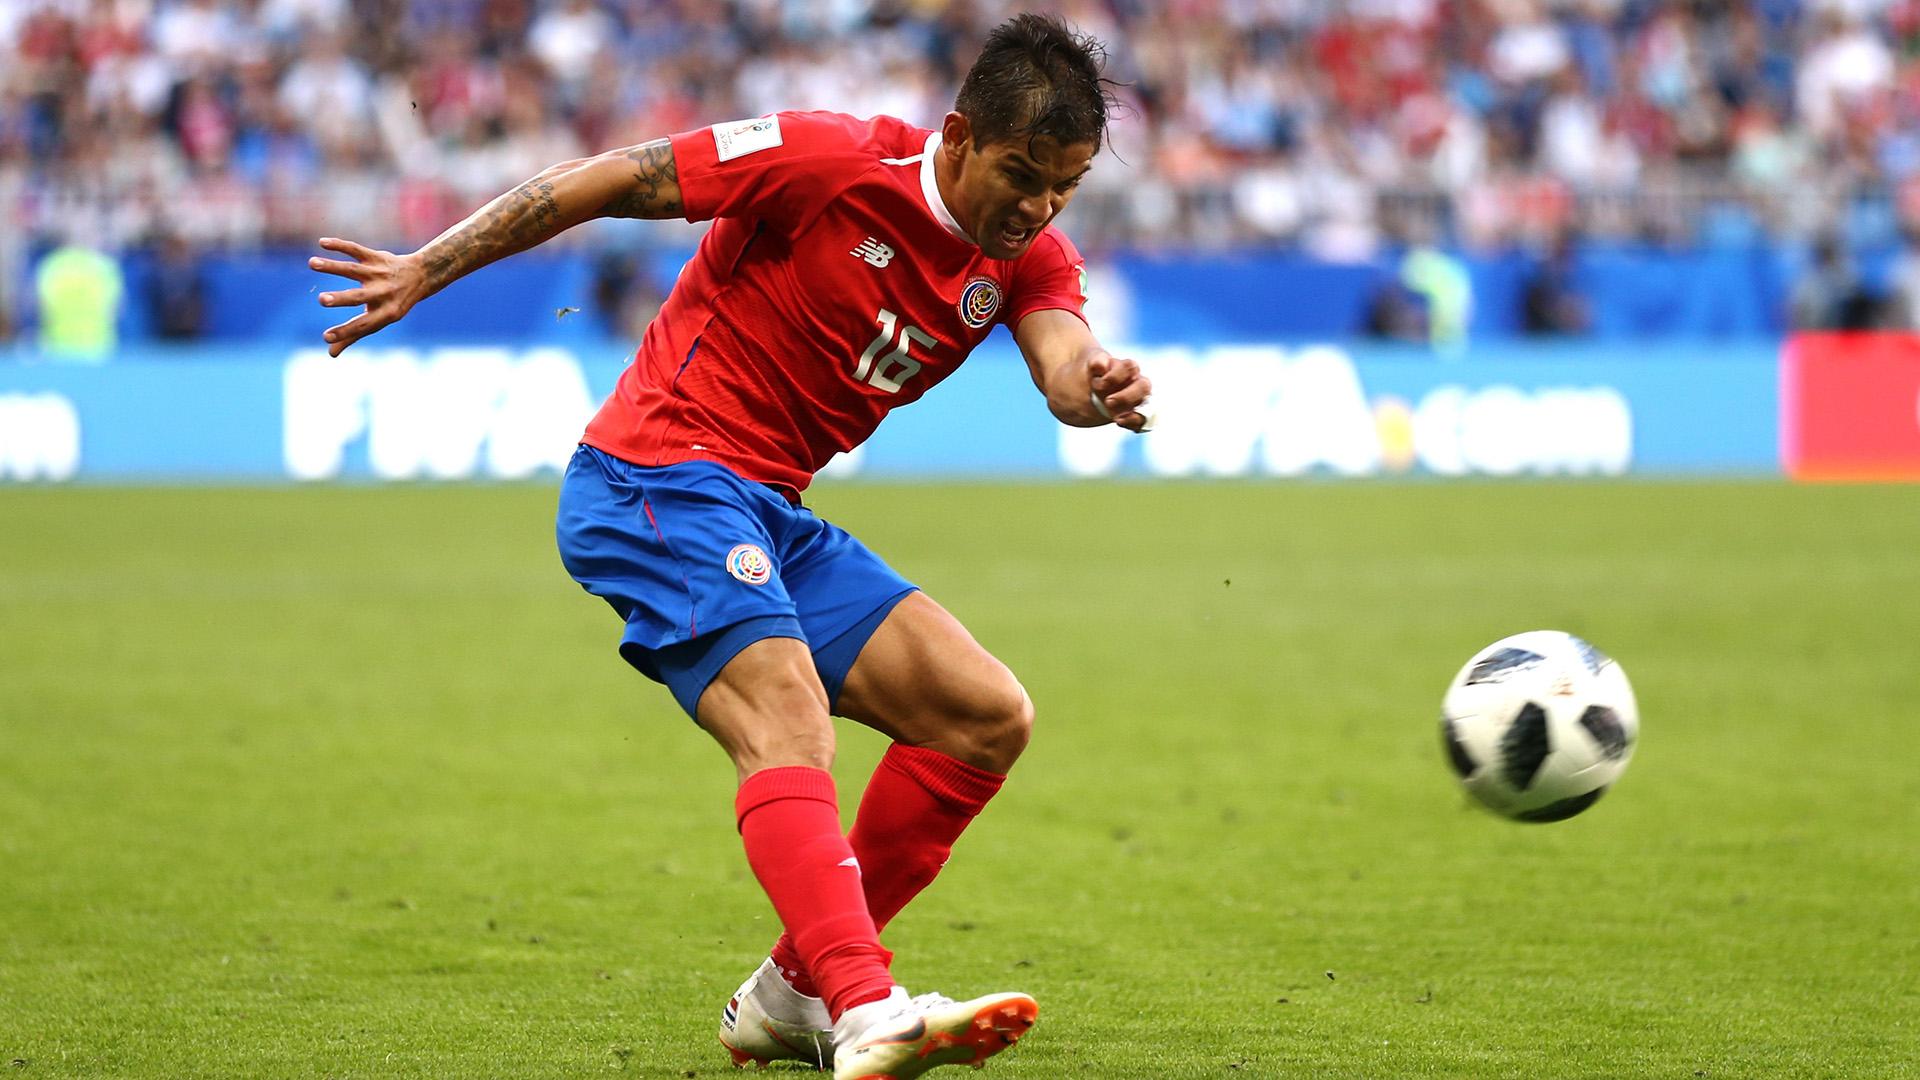 Costa Rica Serbia World Cup 2018